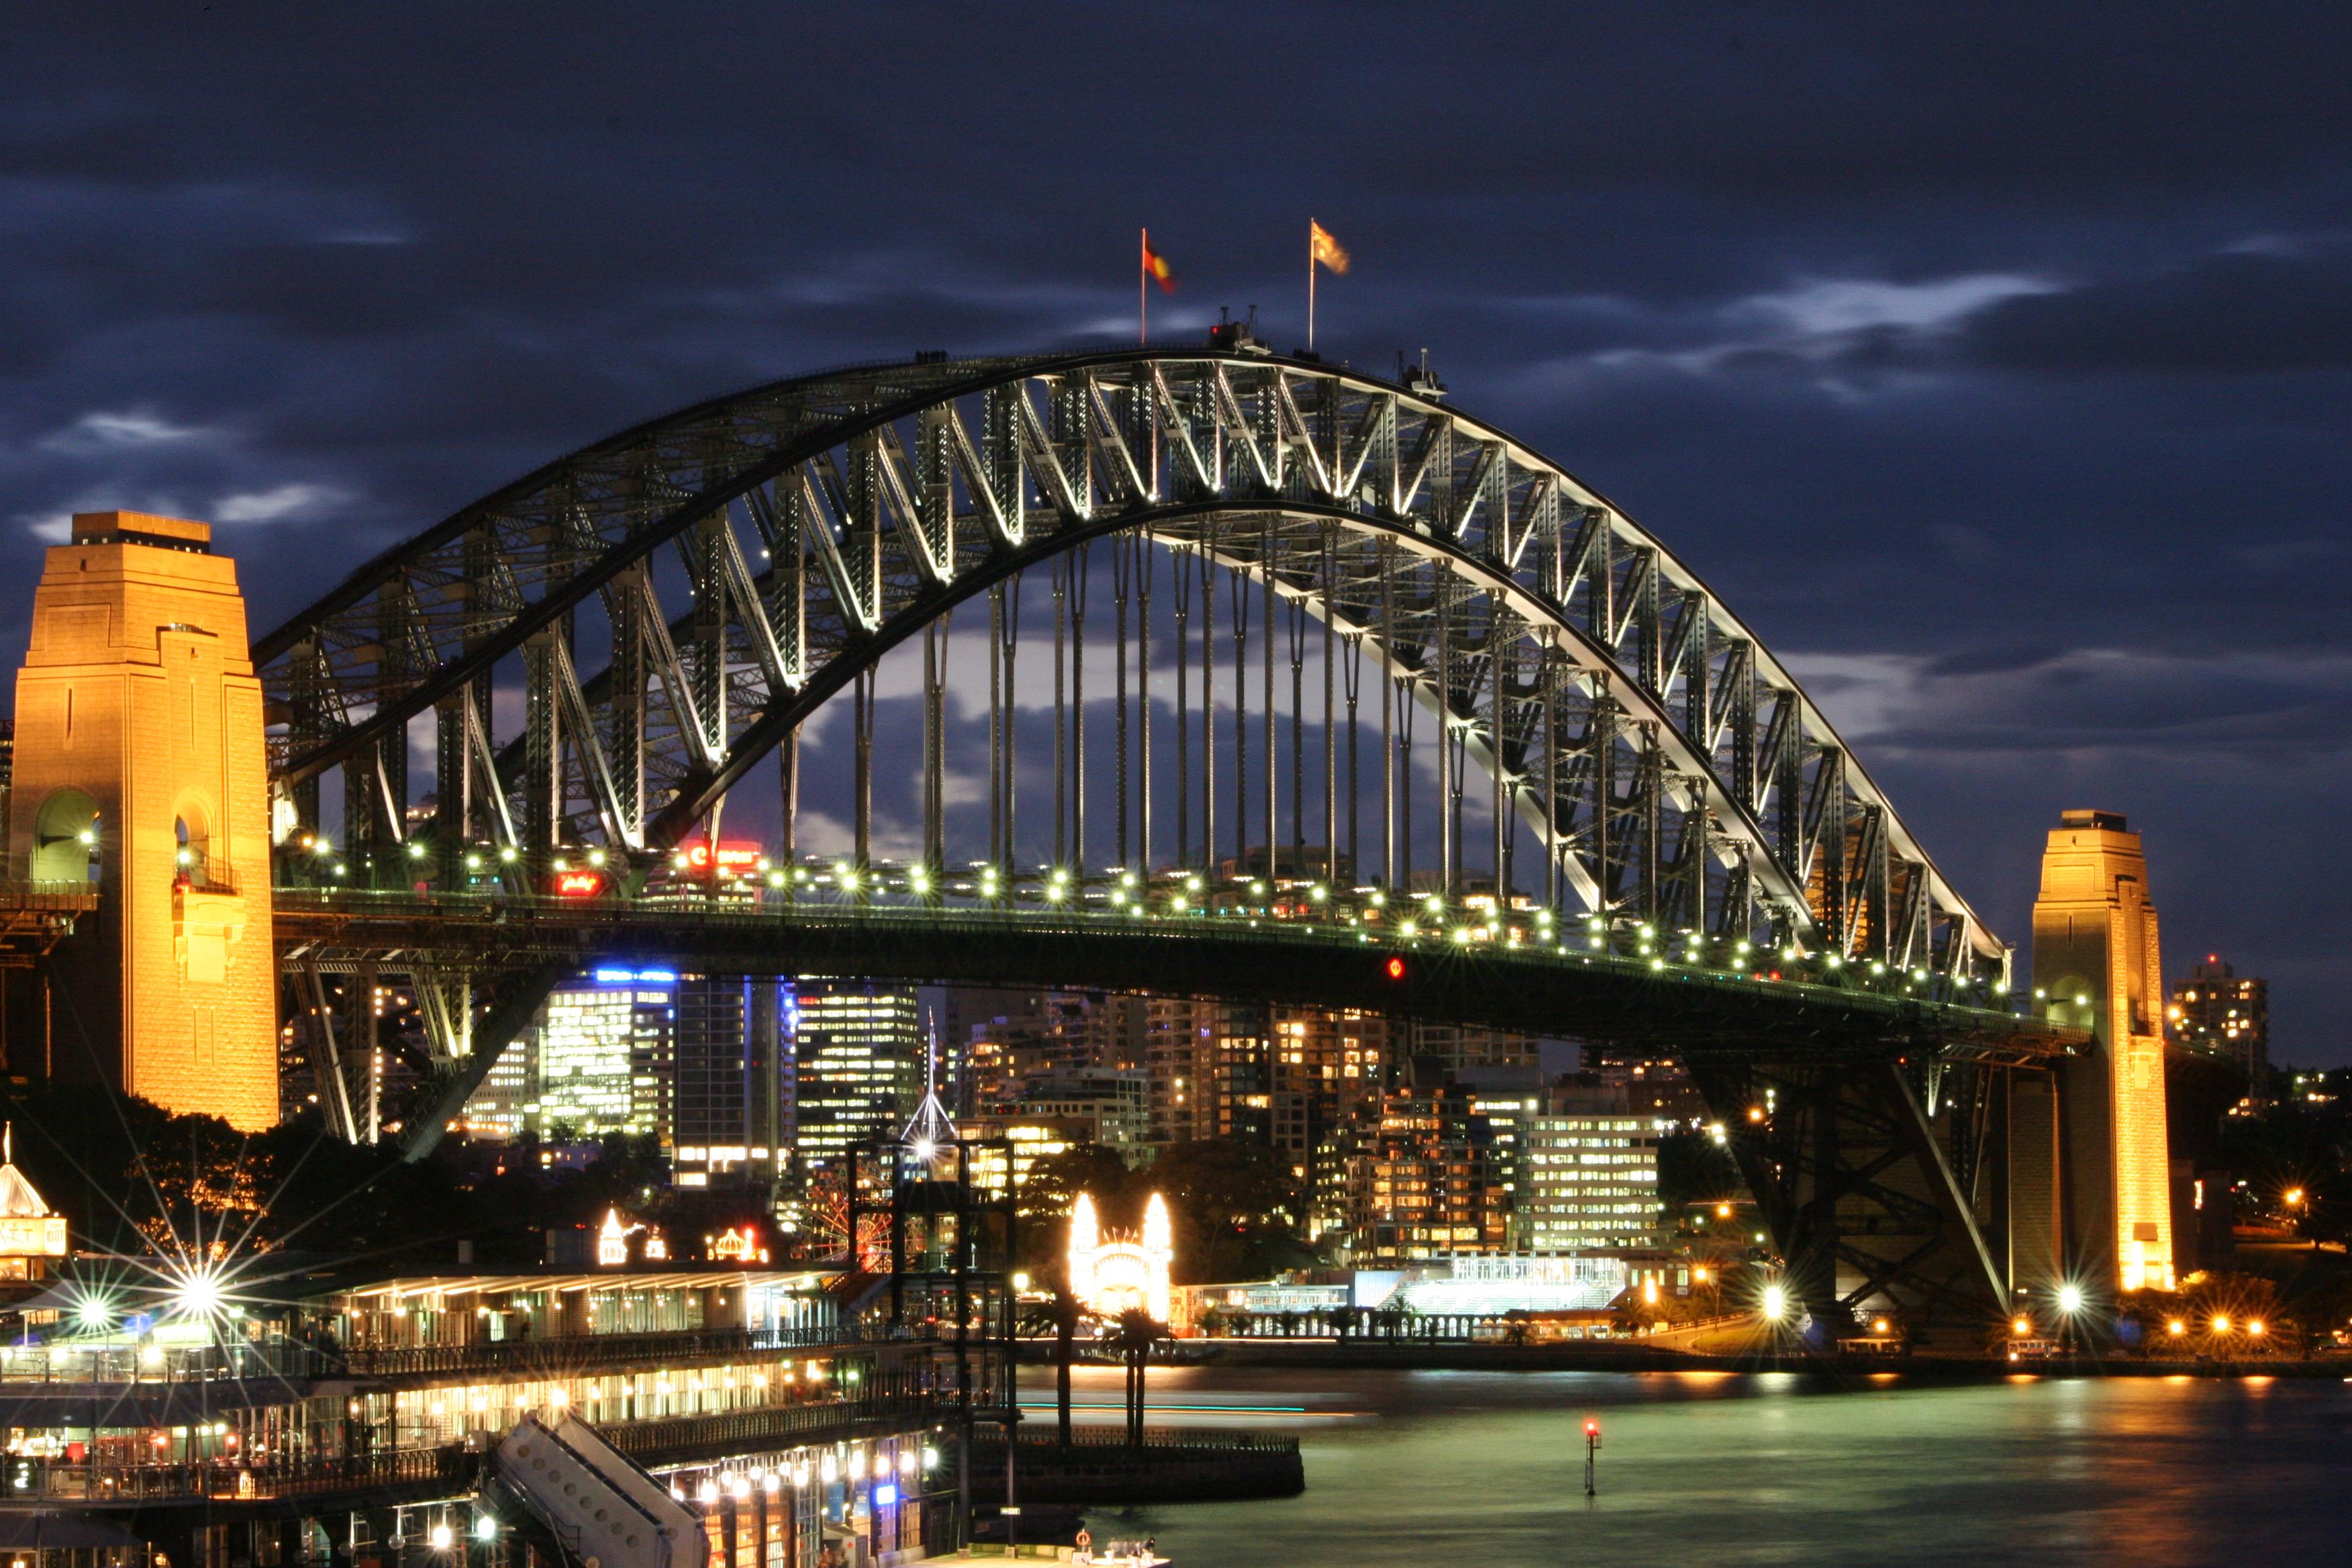 Sydney Harbour Bridge Hd Wallpaper Background Image 3504x2336